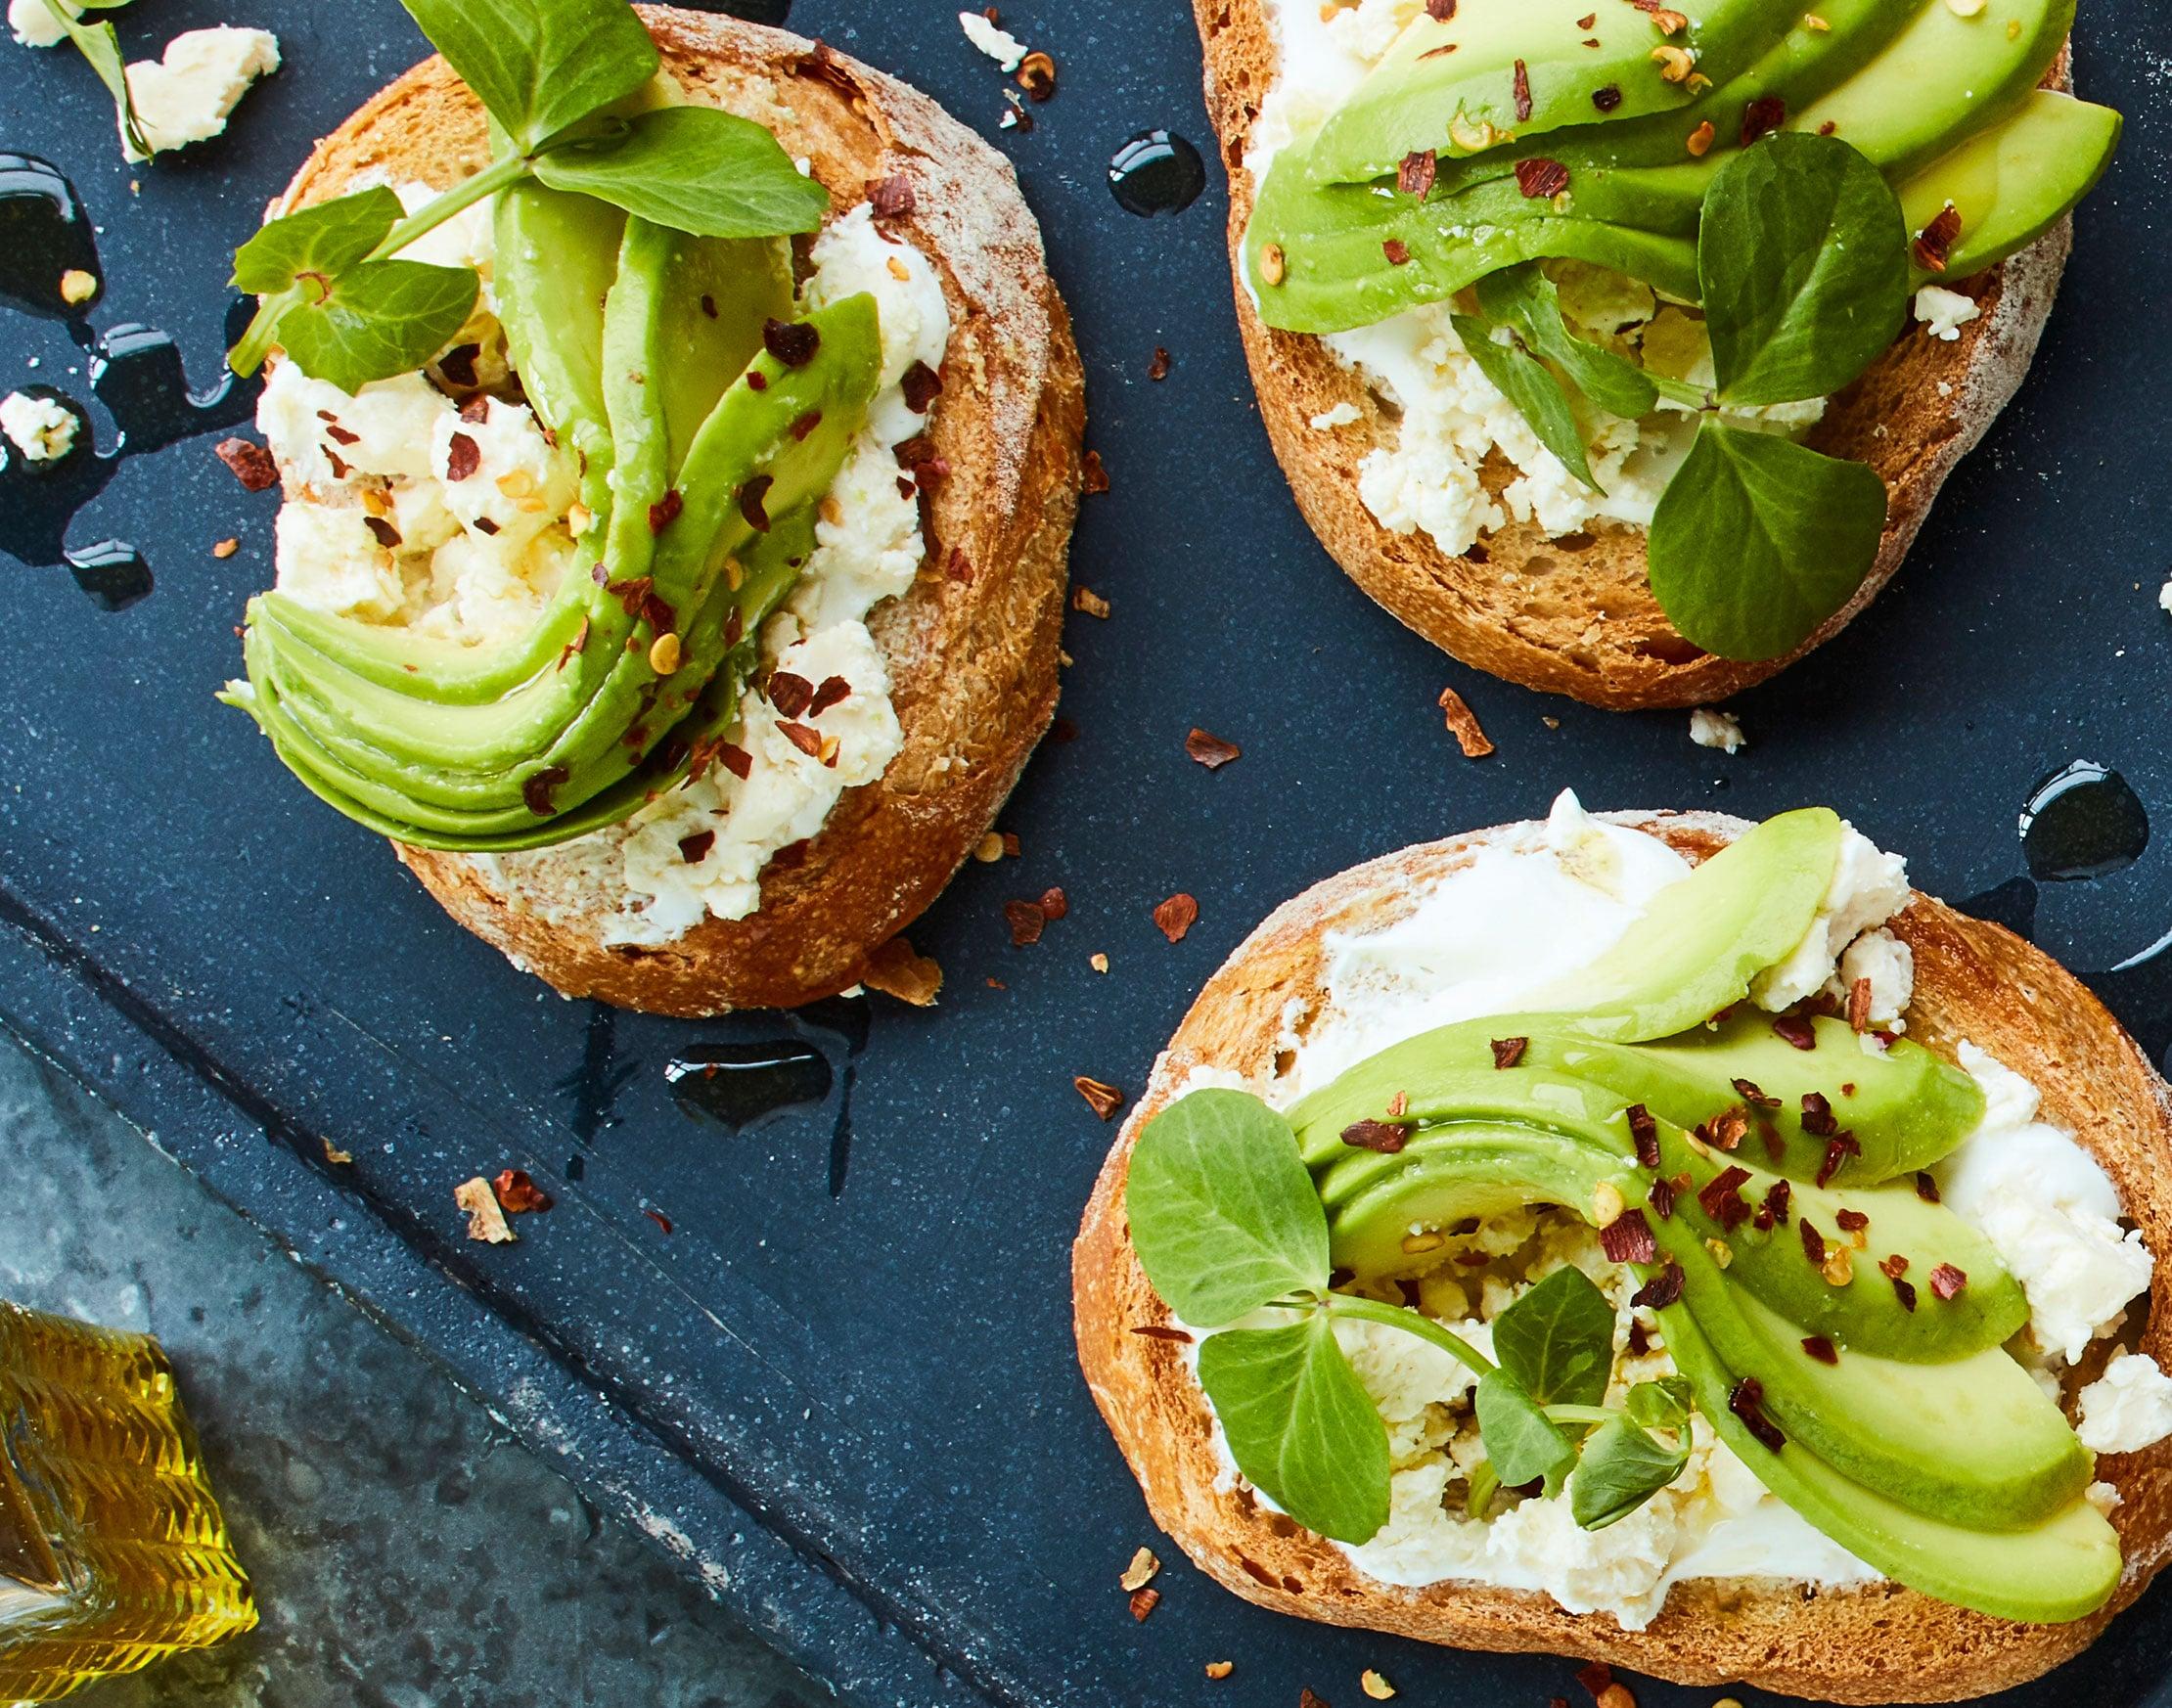 Avocado toast, food styling